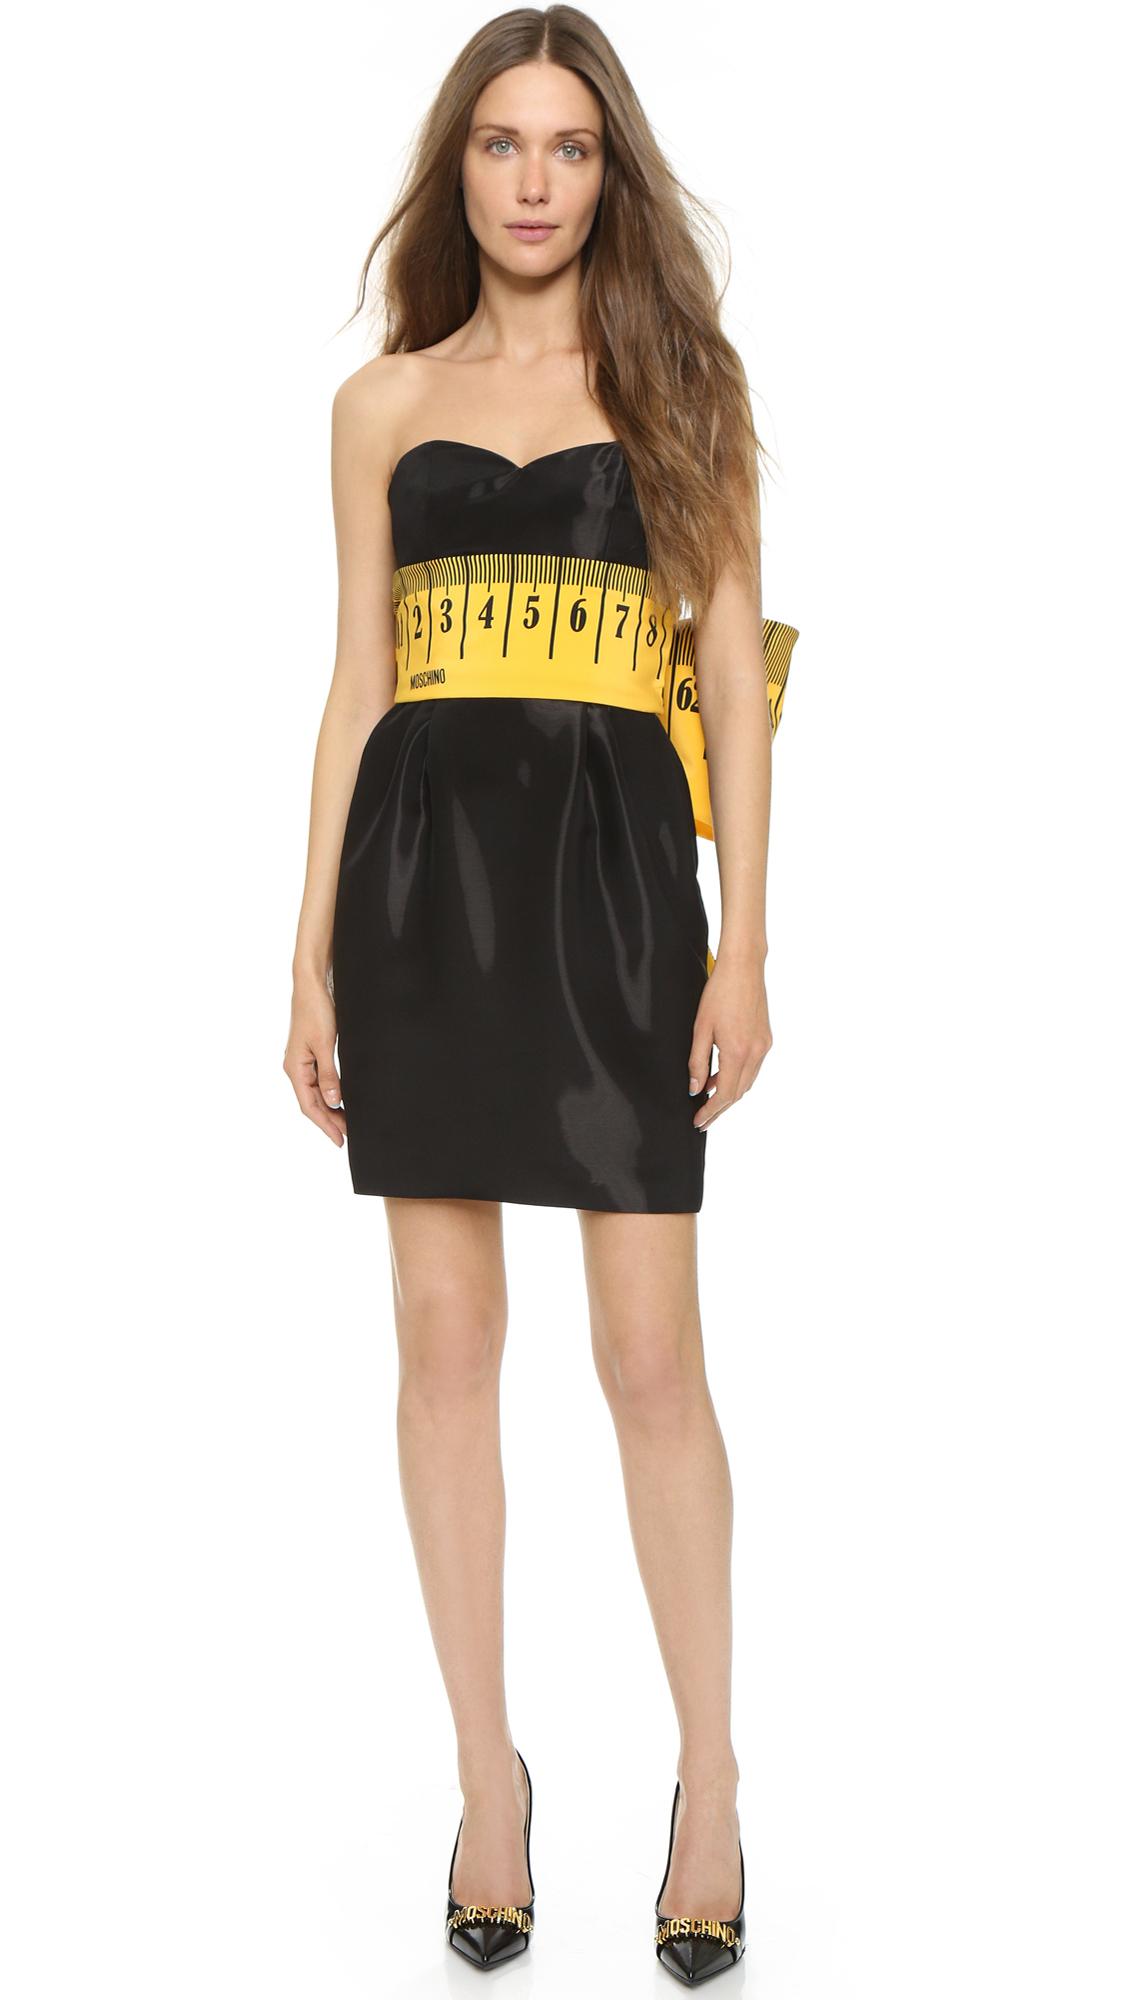 Moschino Measuring Tape Dress Black In Black Lyst